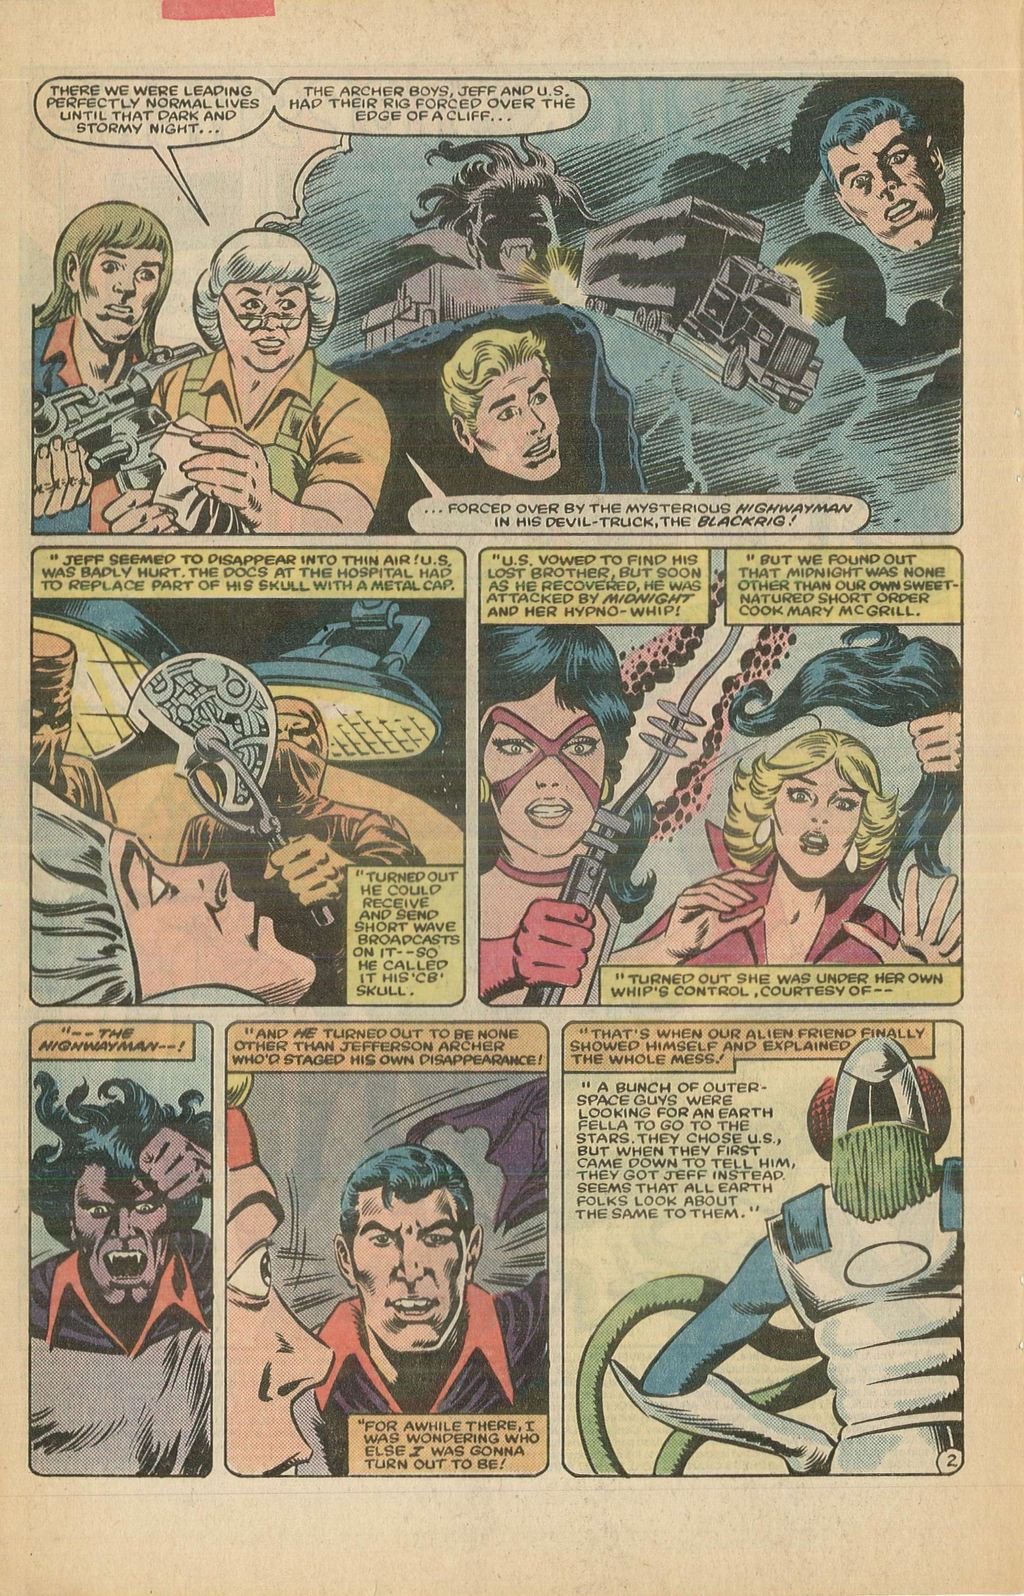 Read online U.S. 1 comic -  Issue #12 - 4